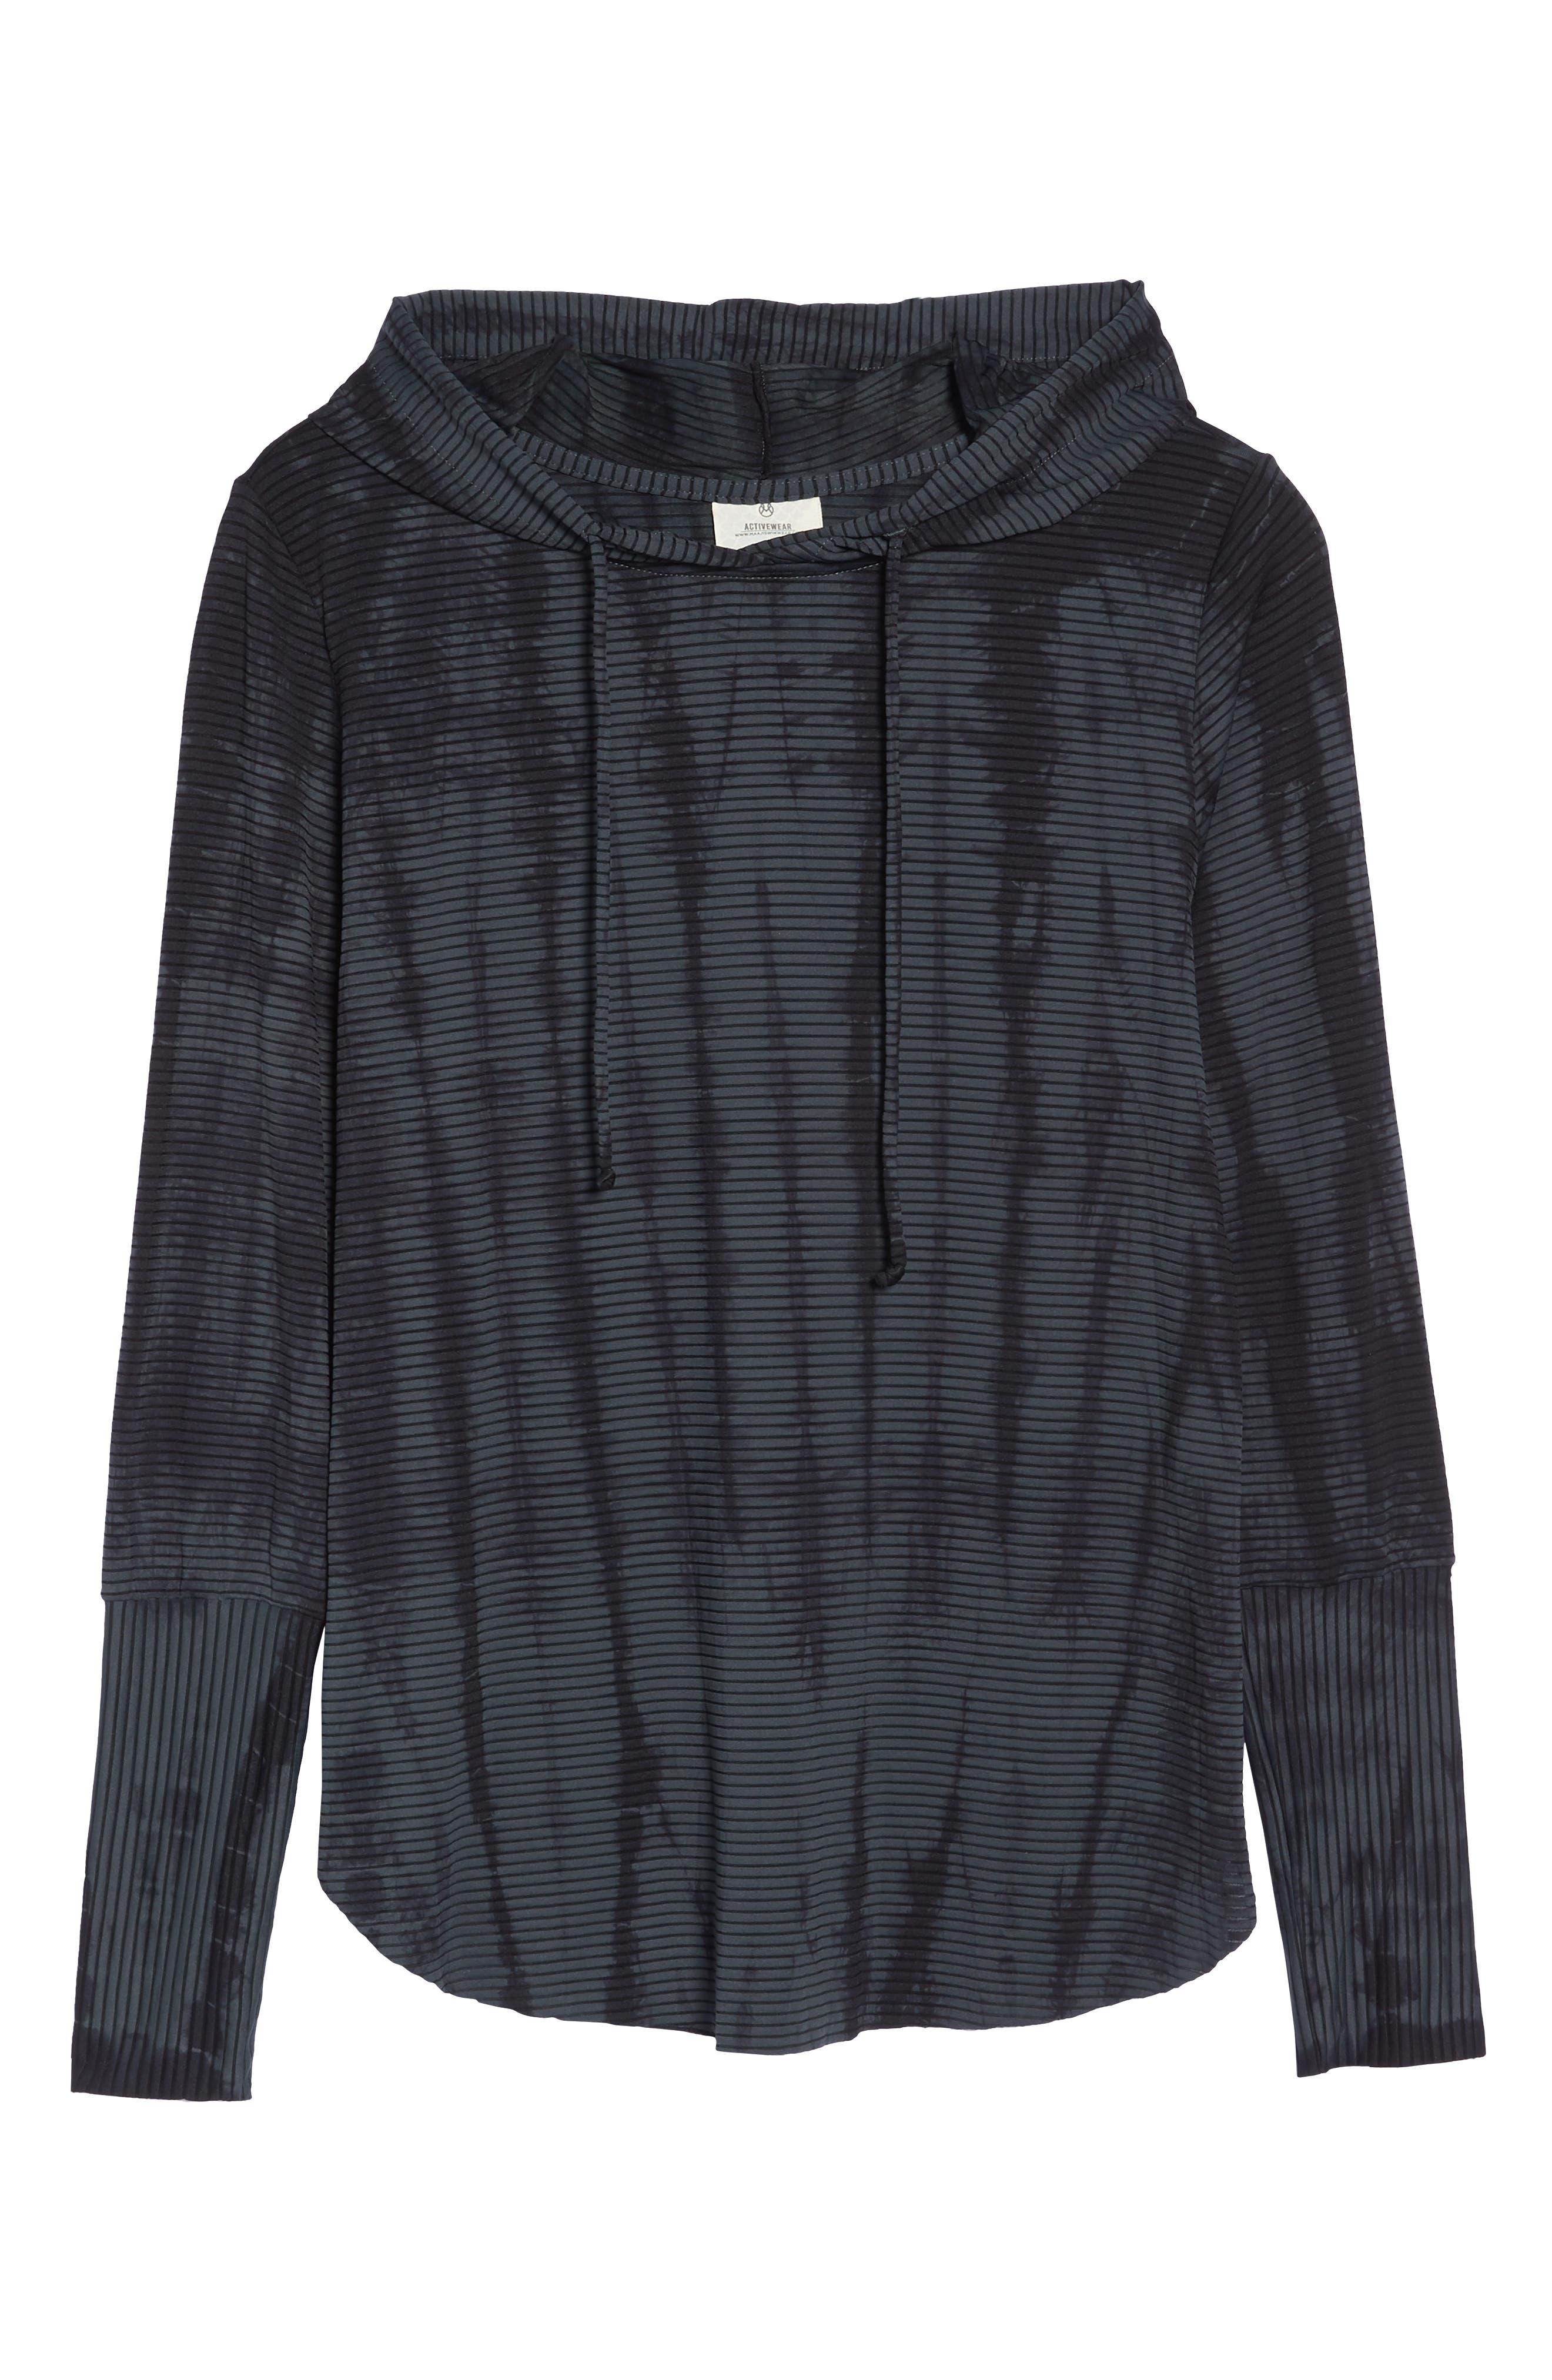 Waves Tie Dye Gray Hooded Pullover,                             Alternate thumbnail 7, color,                             DARK GREY